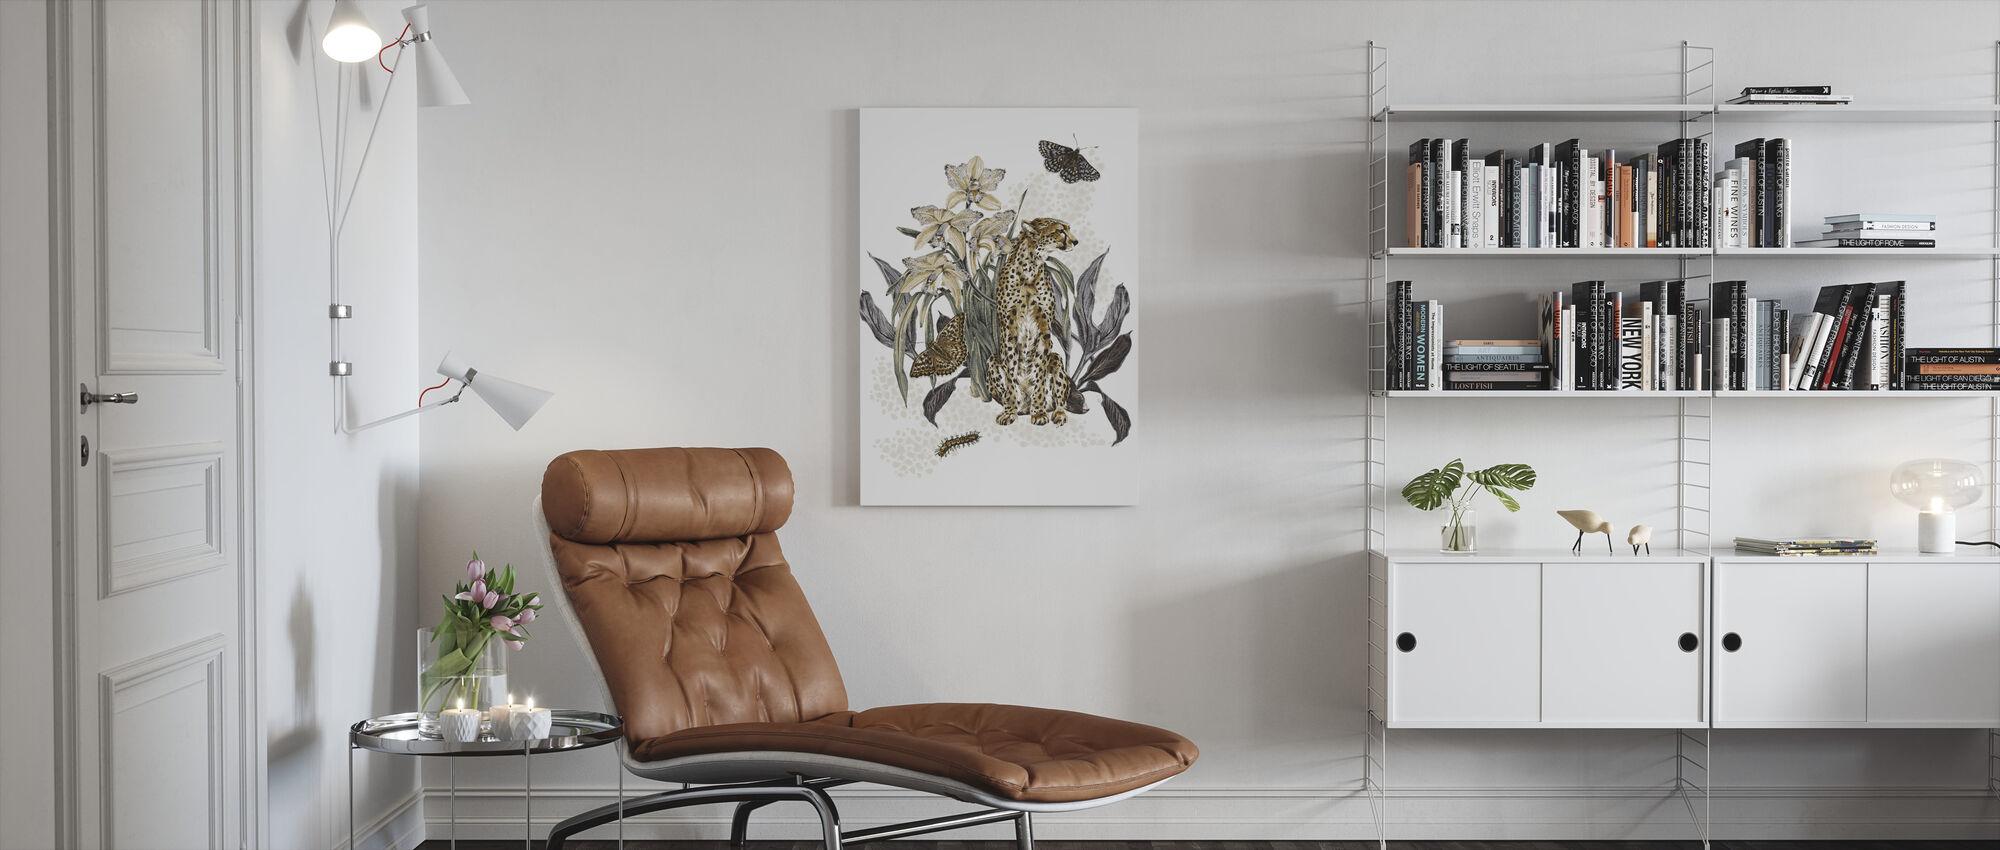 Cheetah Reveries - Cognac and Steel - Canvas print - Living Room